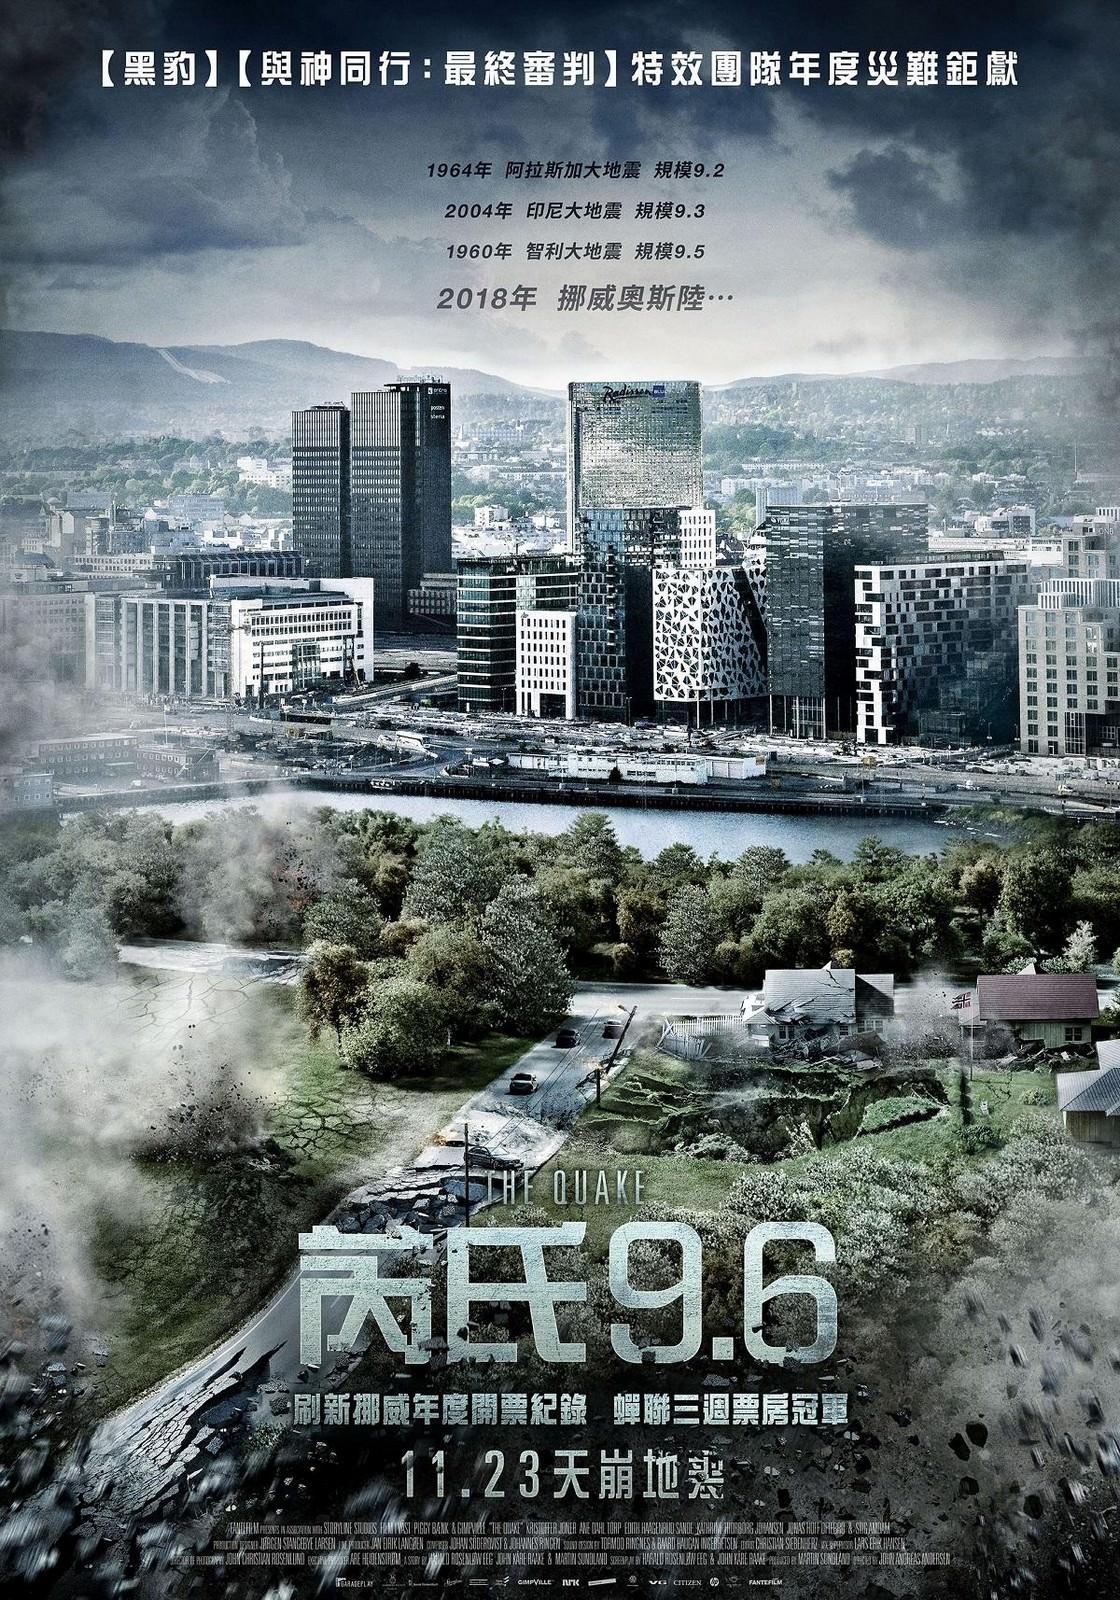 Movie, Skjelvet(挪威, 2018年) / 芮氏9.6(台灣) / 八級大地震:命懸一劫(香港) / The Quake(英文), 電影海報, 台灣